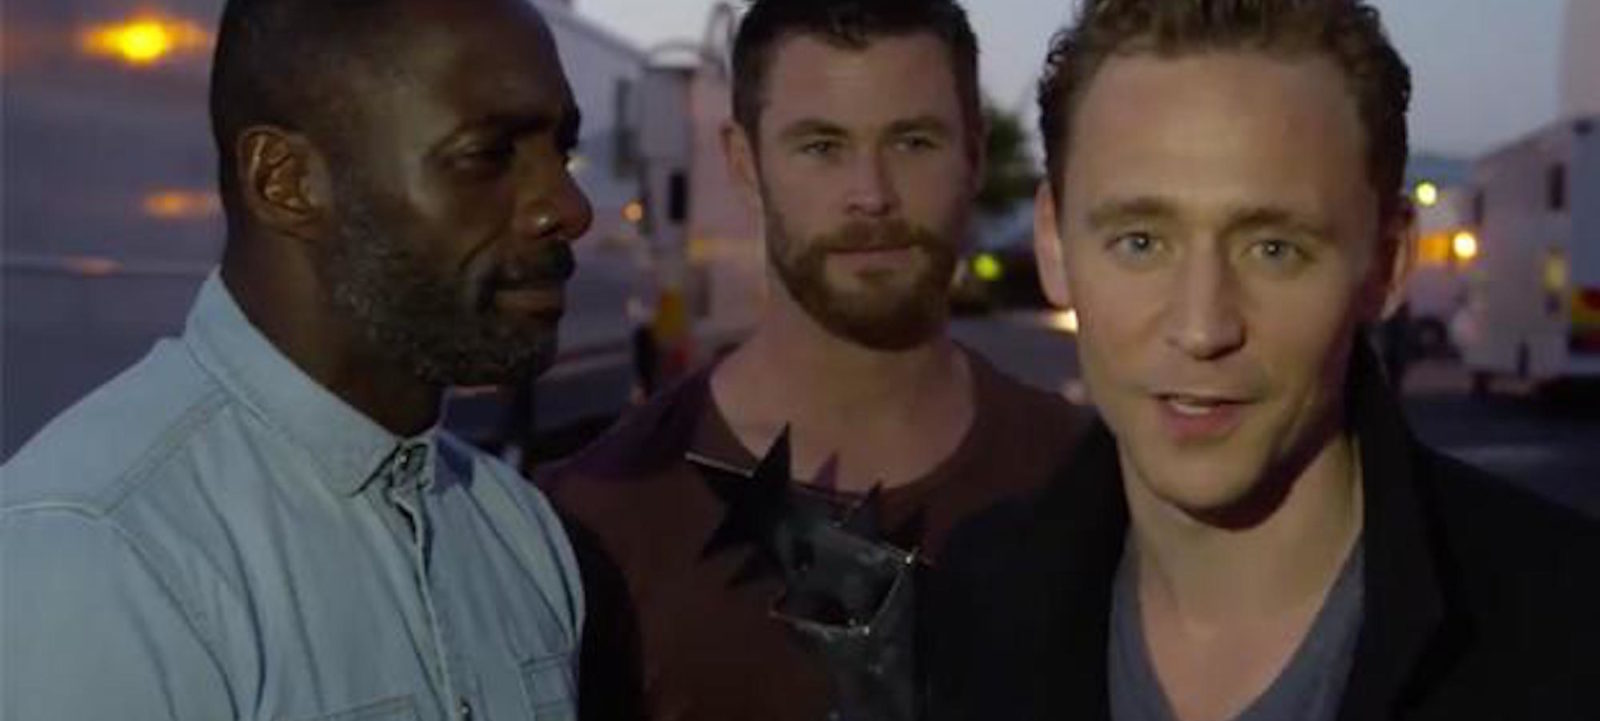 Idris Elba, Chris Hemsworth and Tom Hiddleston